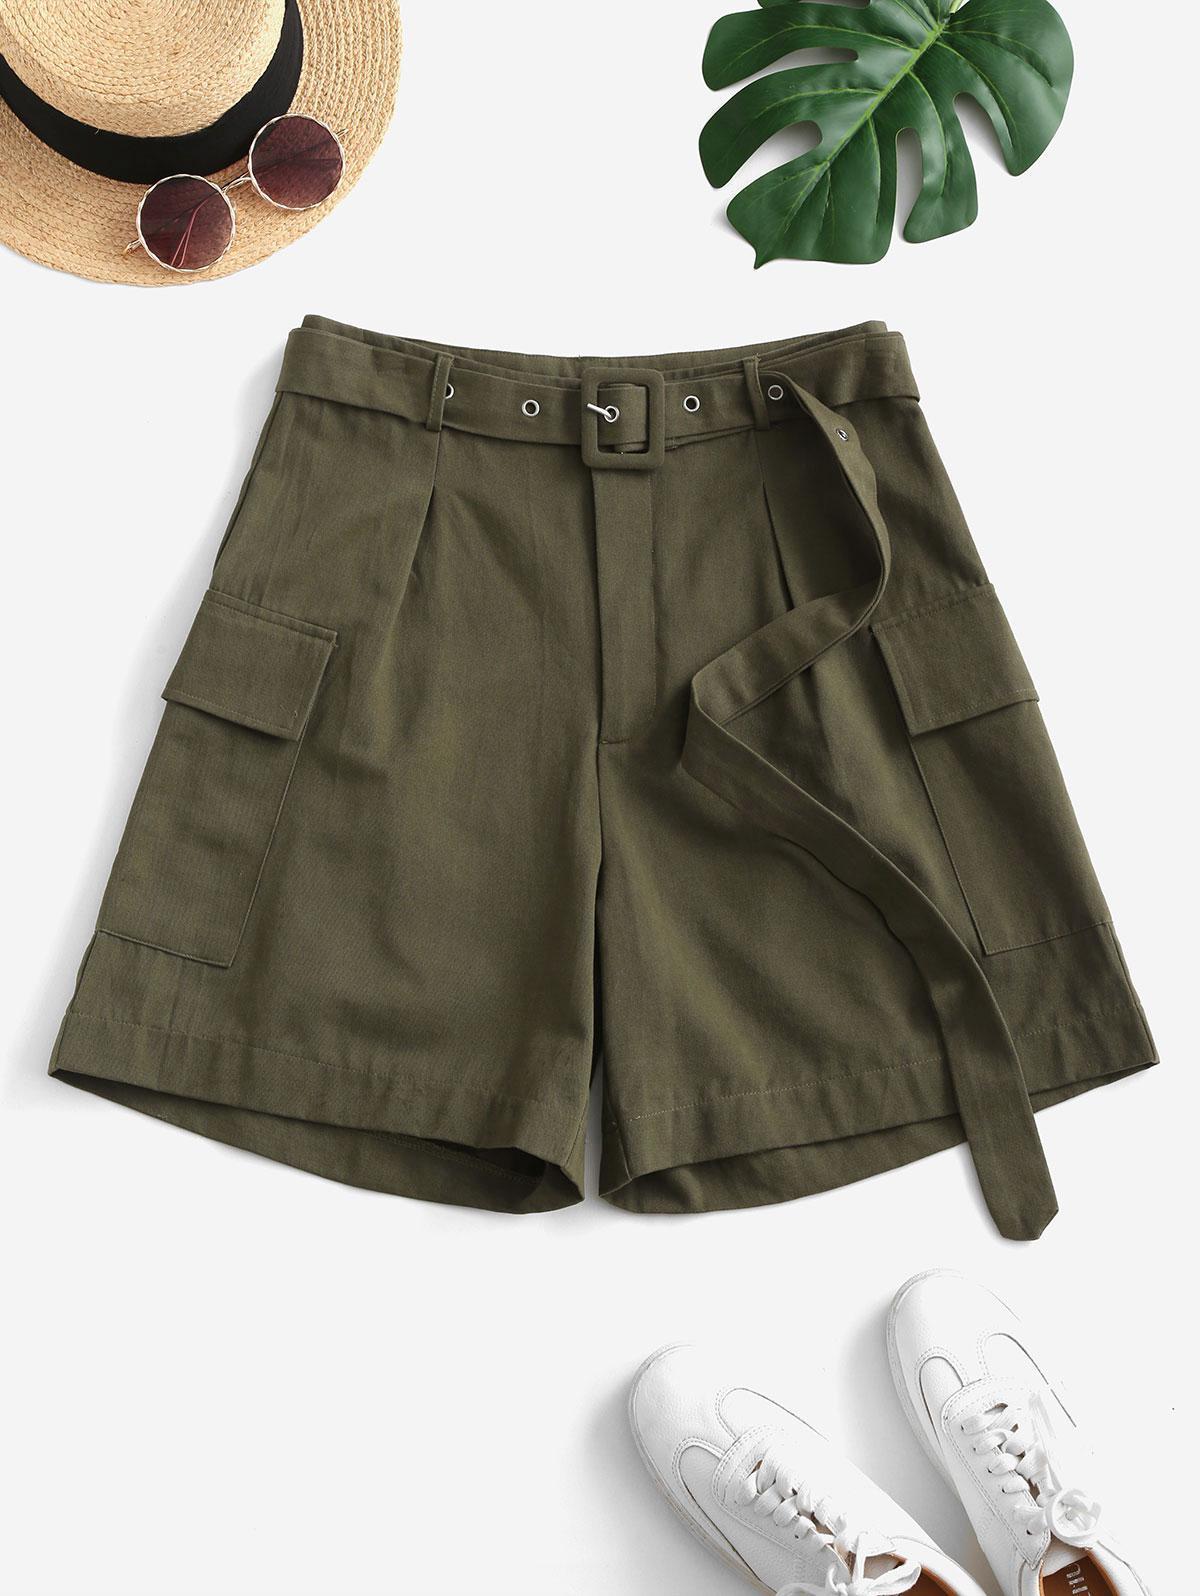 ZAFUL High Waisted Buckle Belted Flap Pockets Cargo Shorts